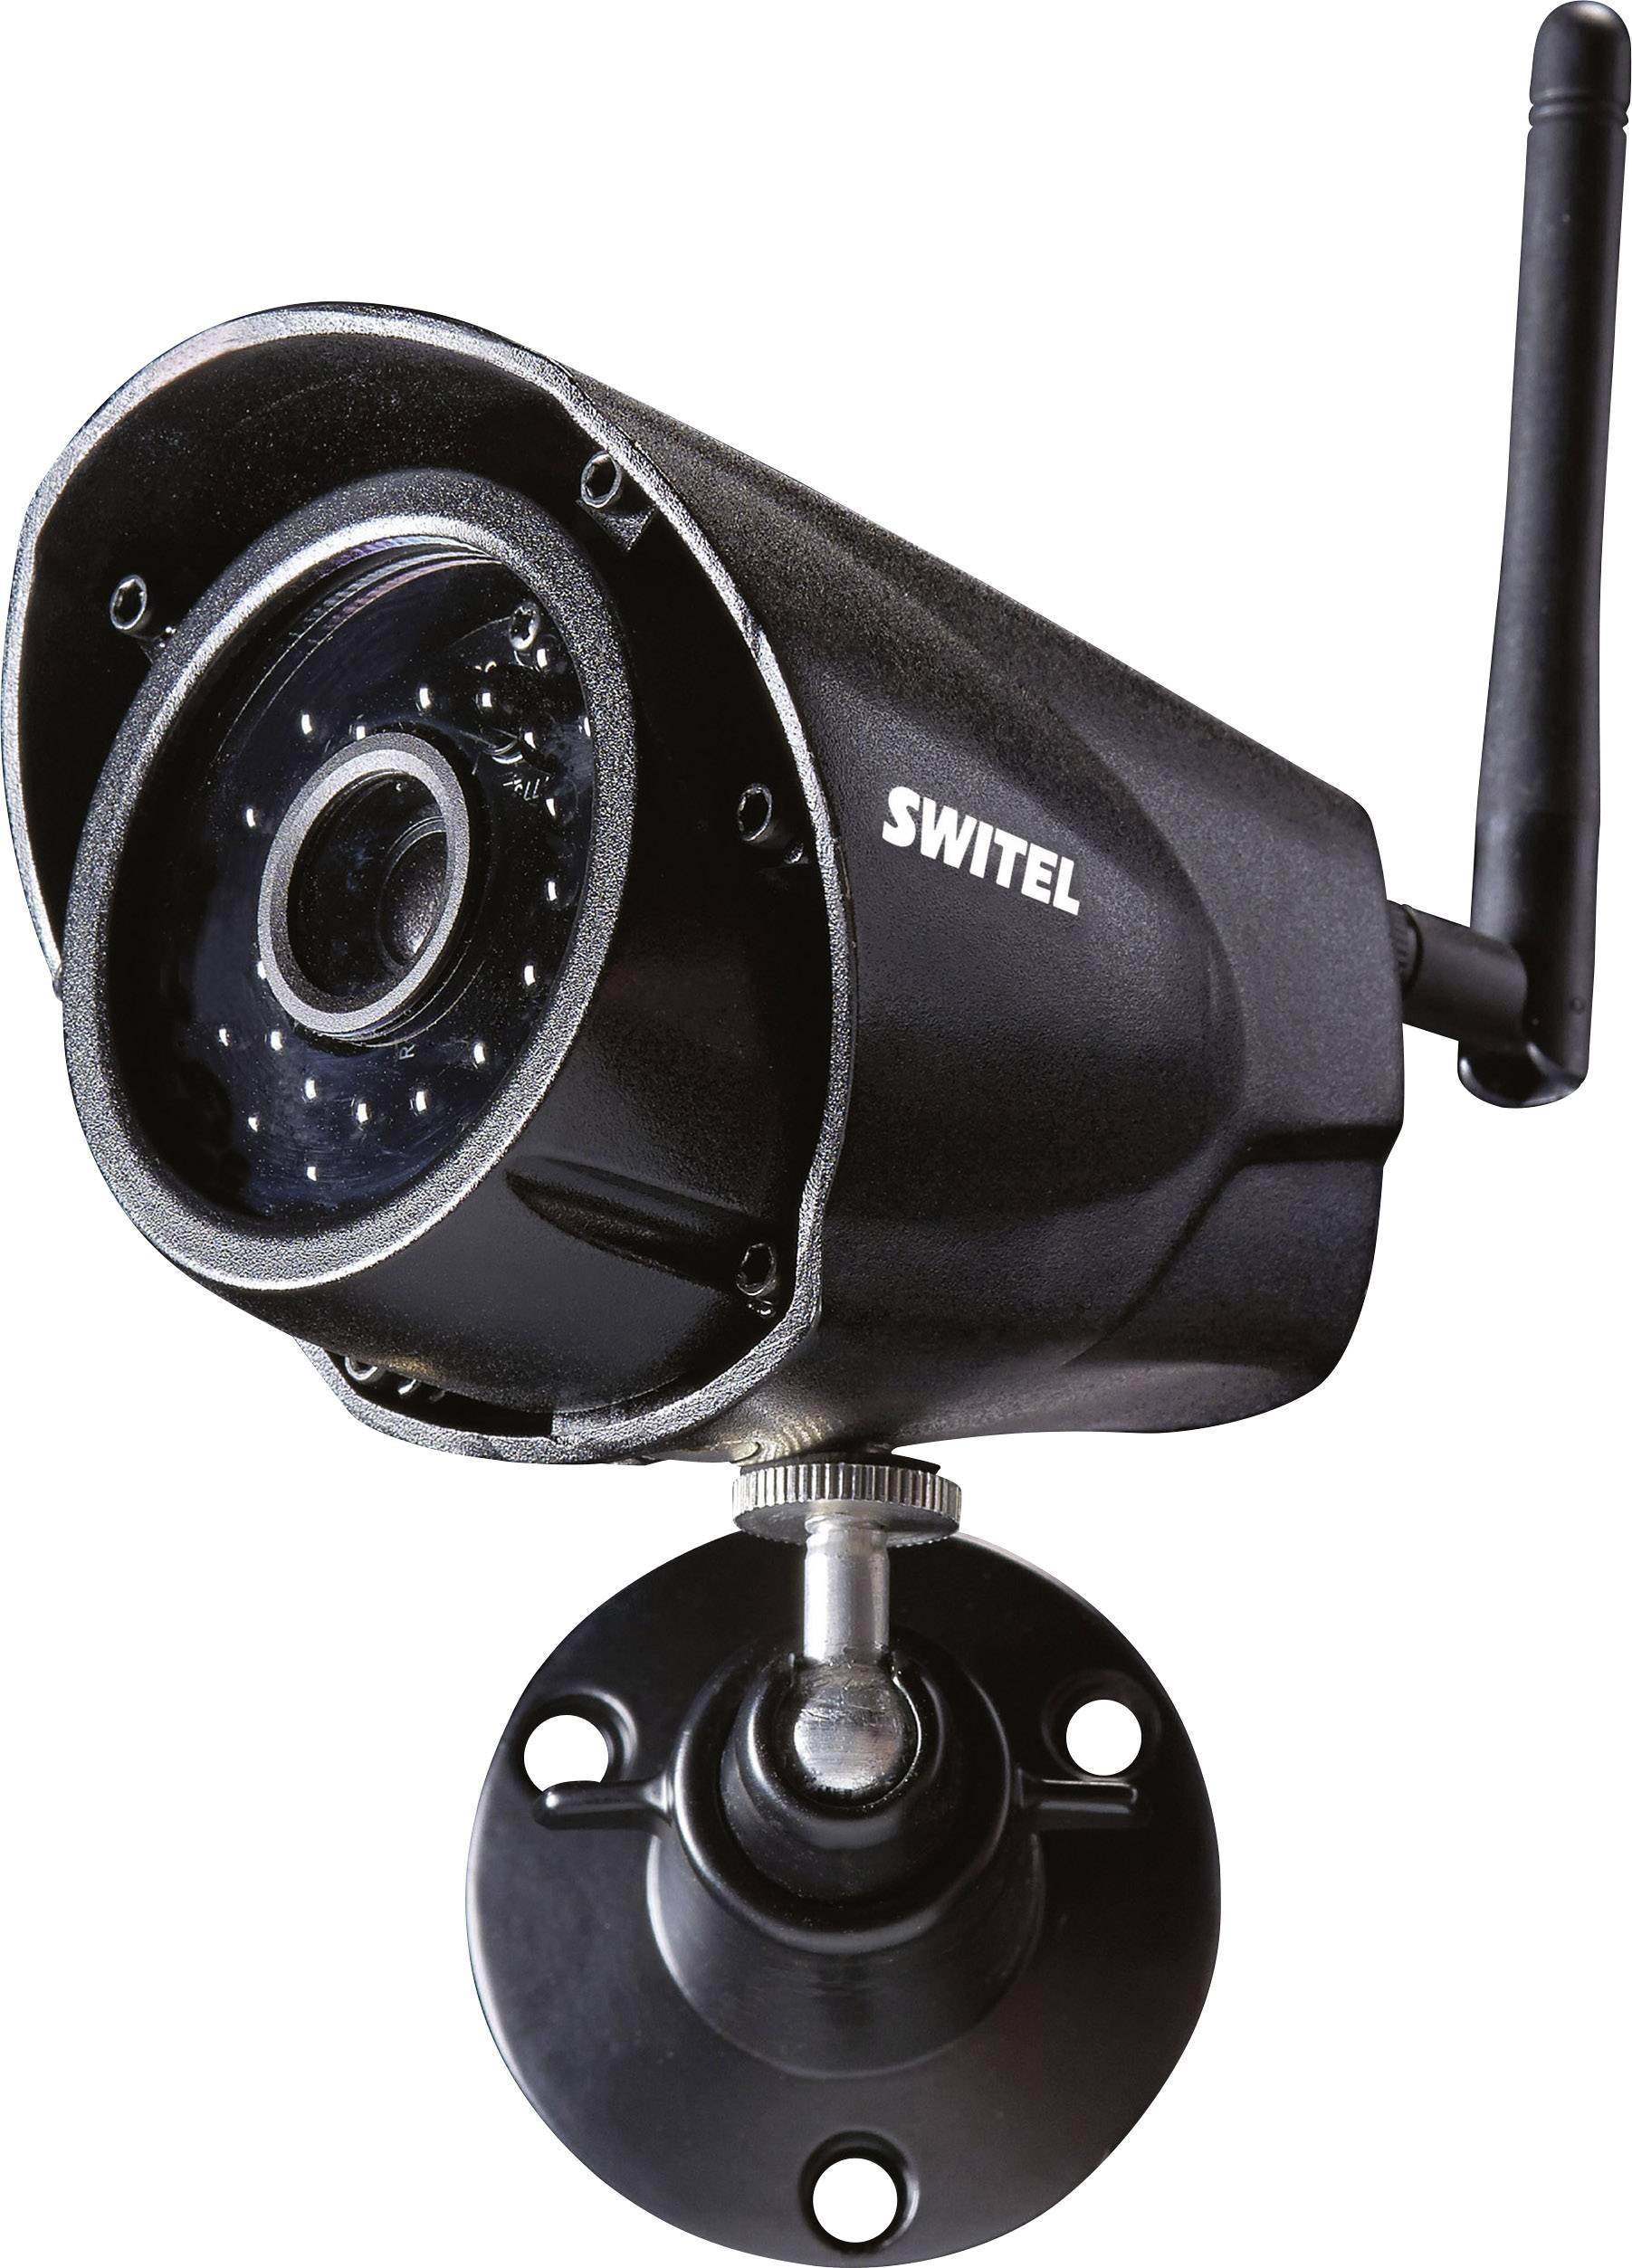 Switel CA1000 senza fili-Telec